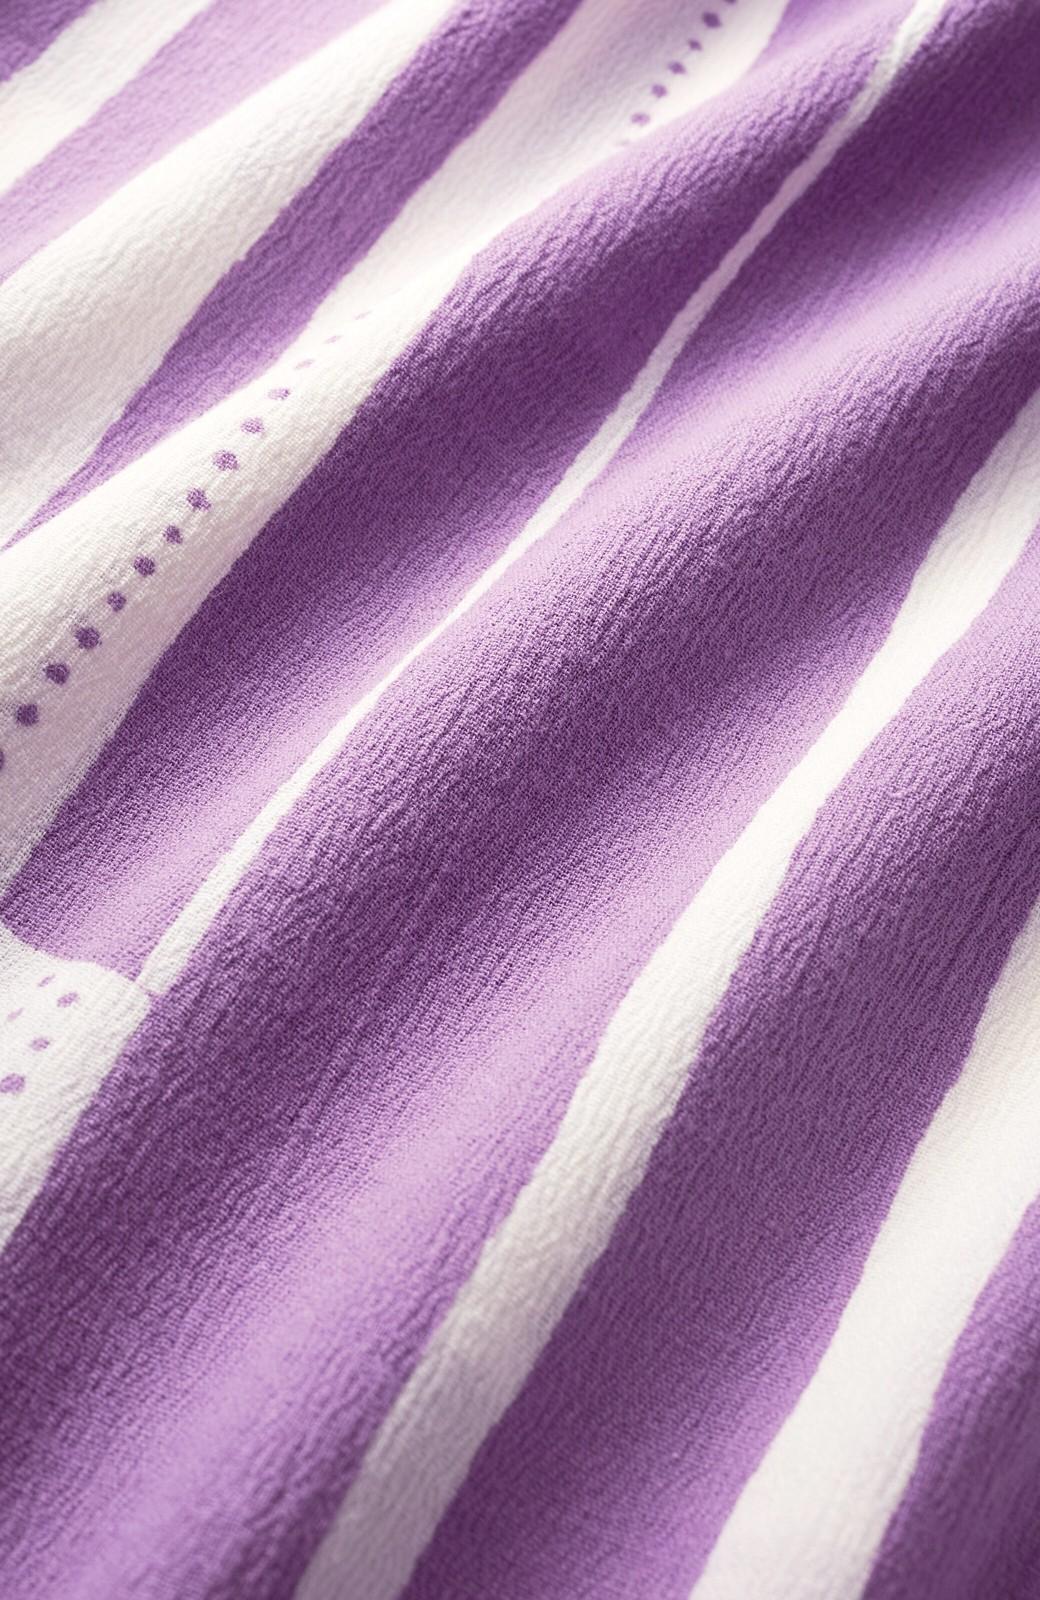 haco! ひでや工房 京都の綿ちりめん浴衣 <パープル>の商品写真4